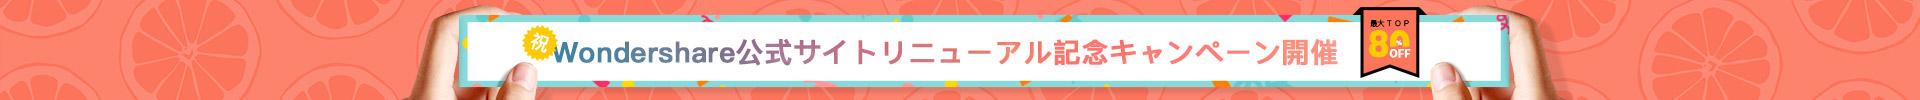 Wondershare公式サイトリニューアル記念キャンペーン